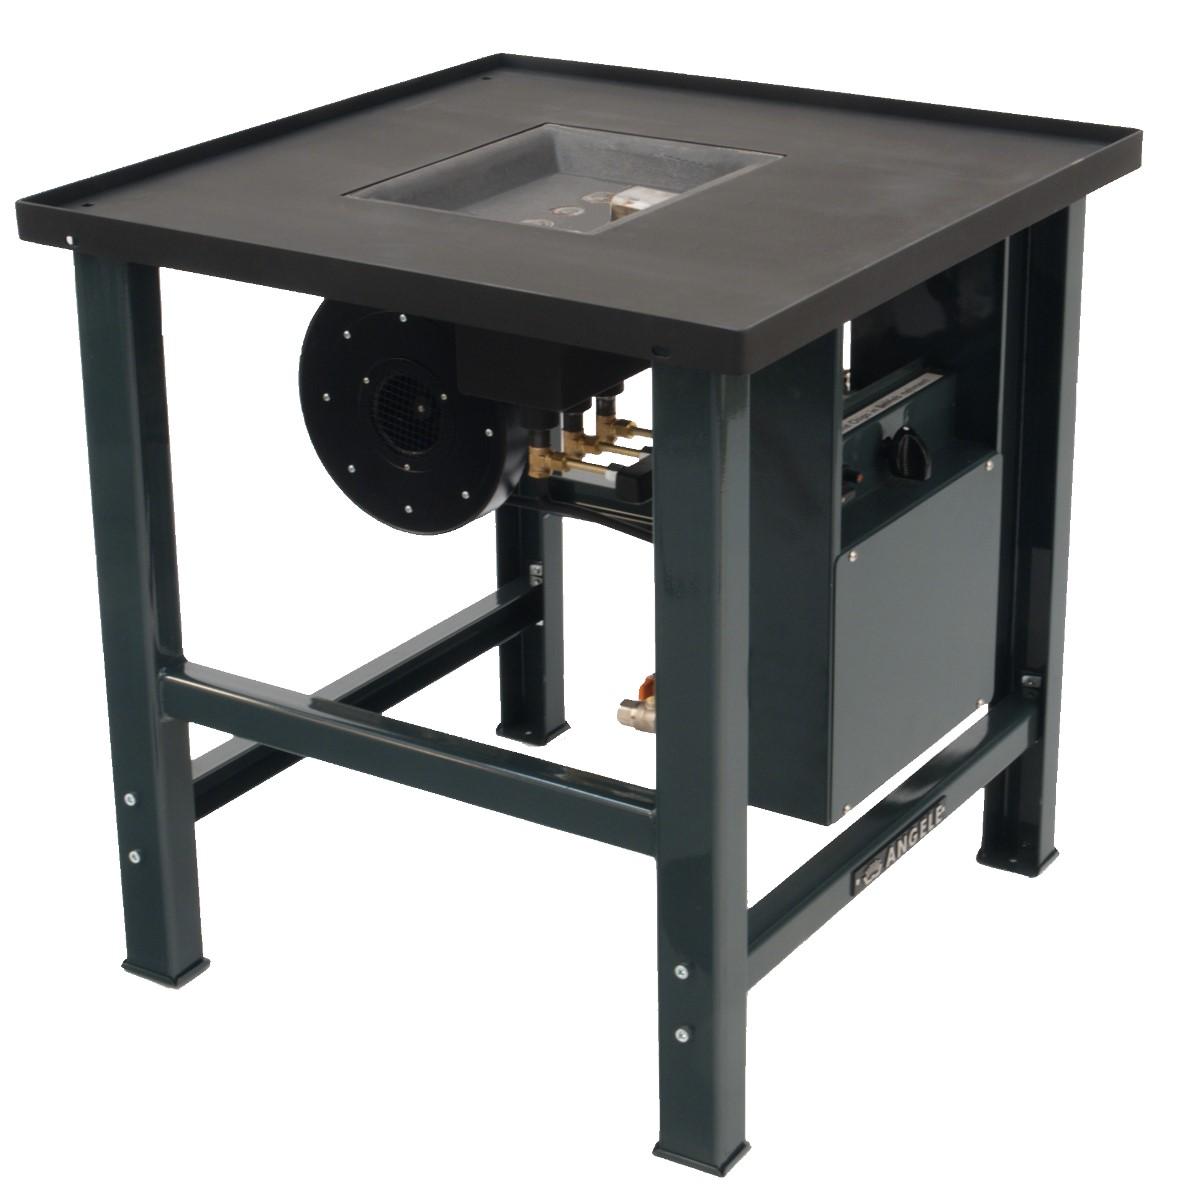 forge gaz type g 800 p forges gaz forges gaz monde de la forge angele shop. Black Bedroom Furniture Sets. Home Design Ideas